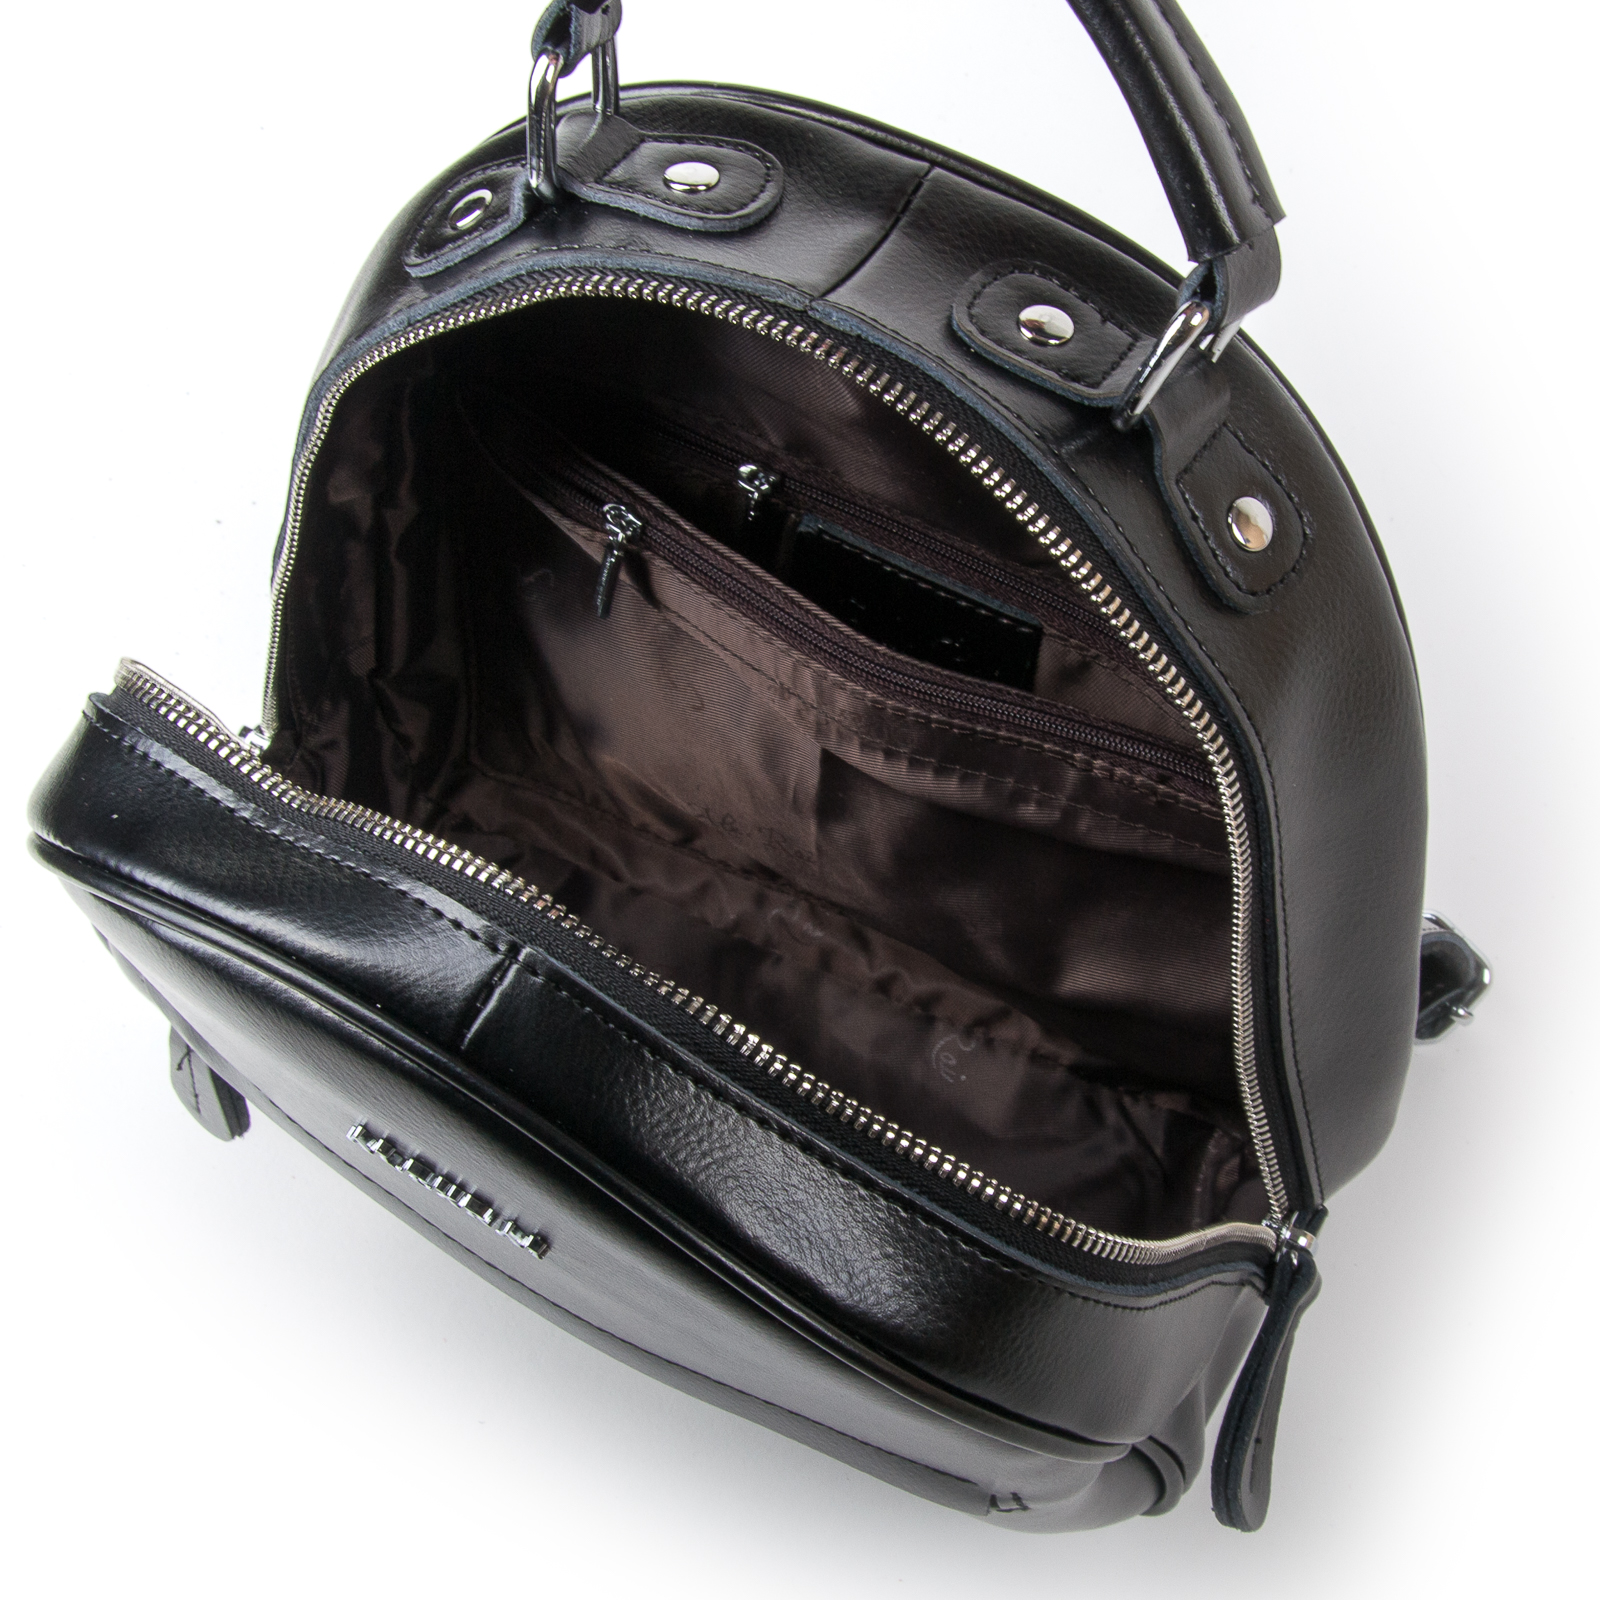 Сумка Женская Рюкзак кожа ALEX RAI 03-01 8715 black - фото 5